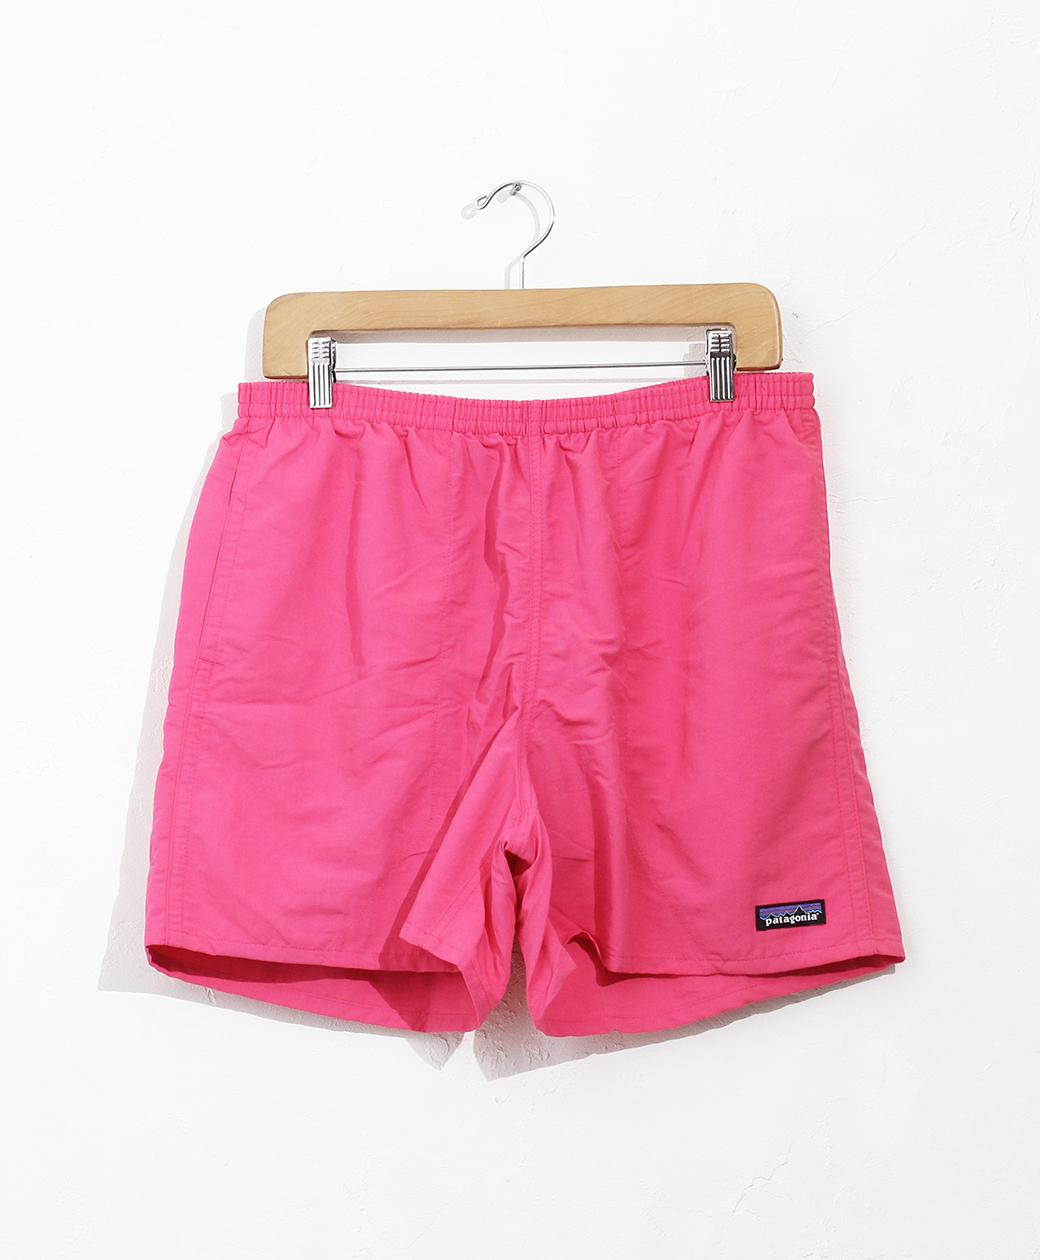 patagonia M's Baggies Shorts 5(ULPK)